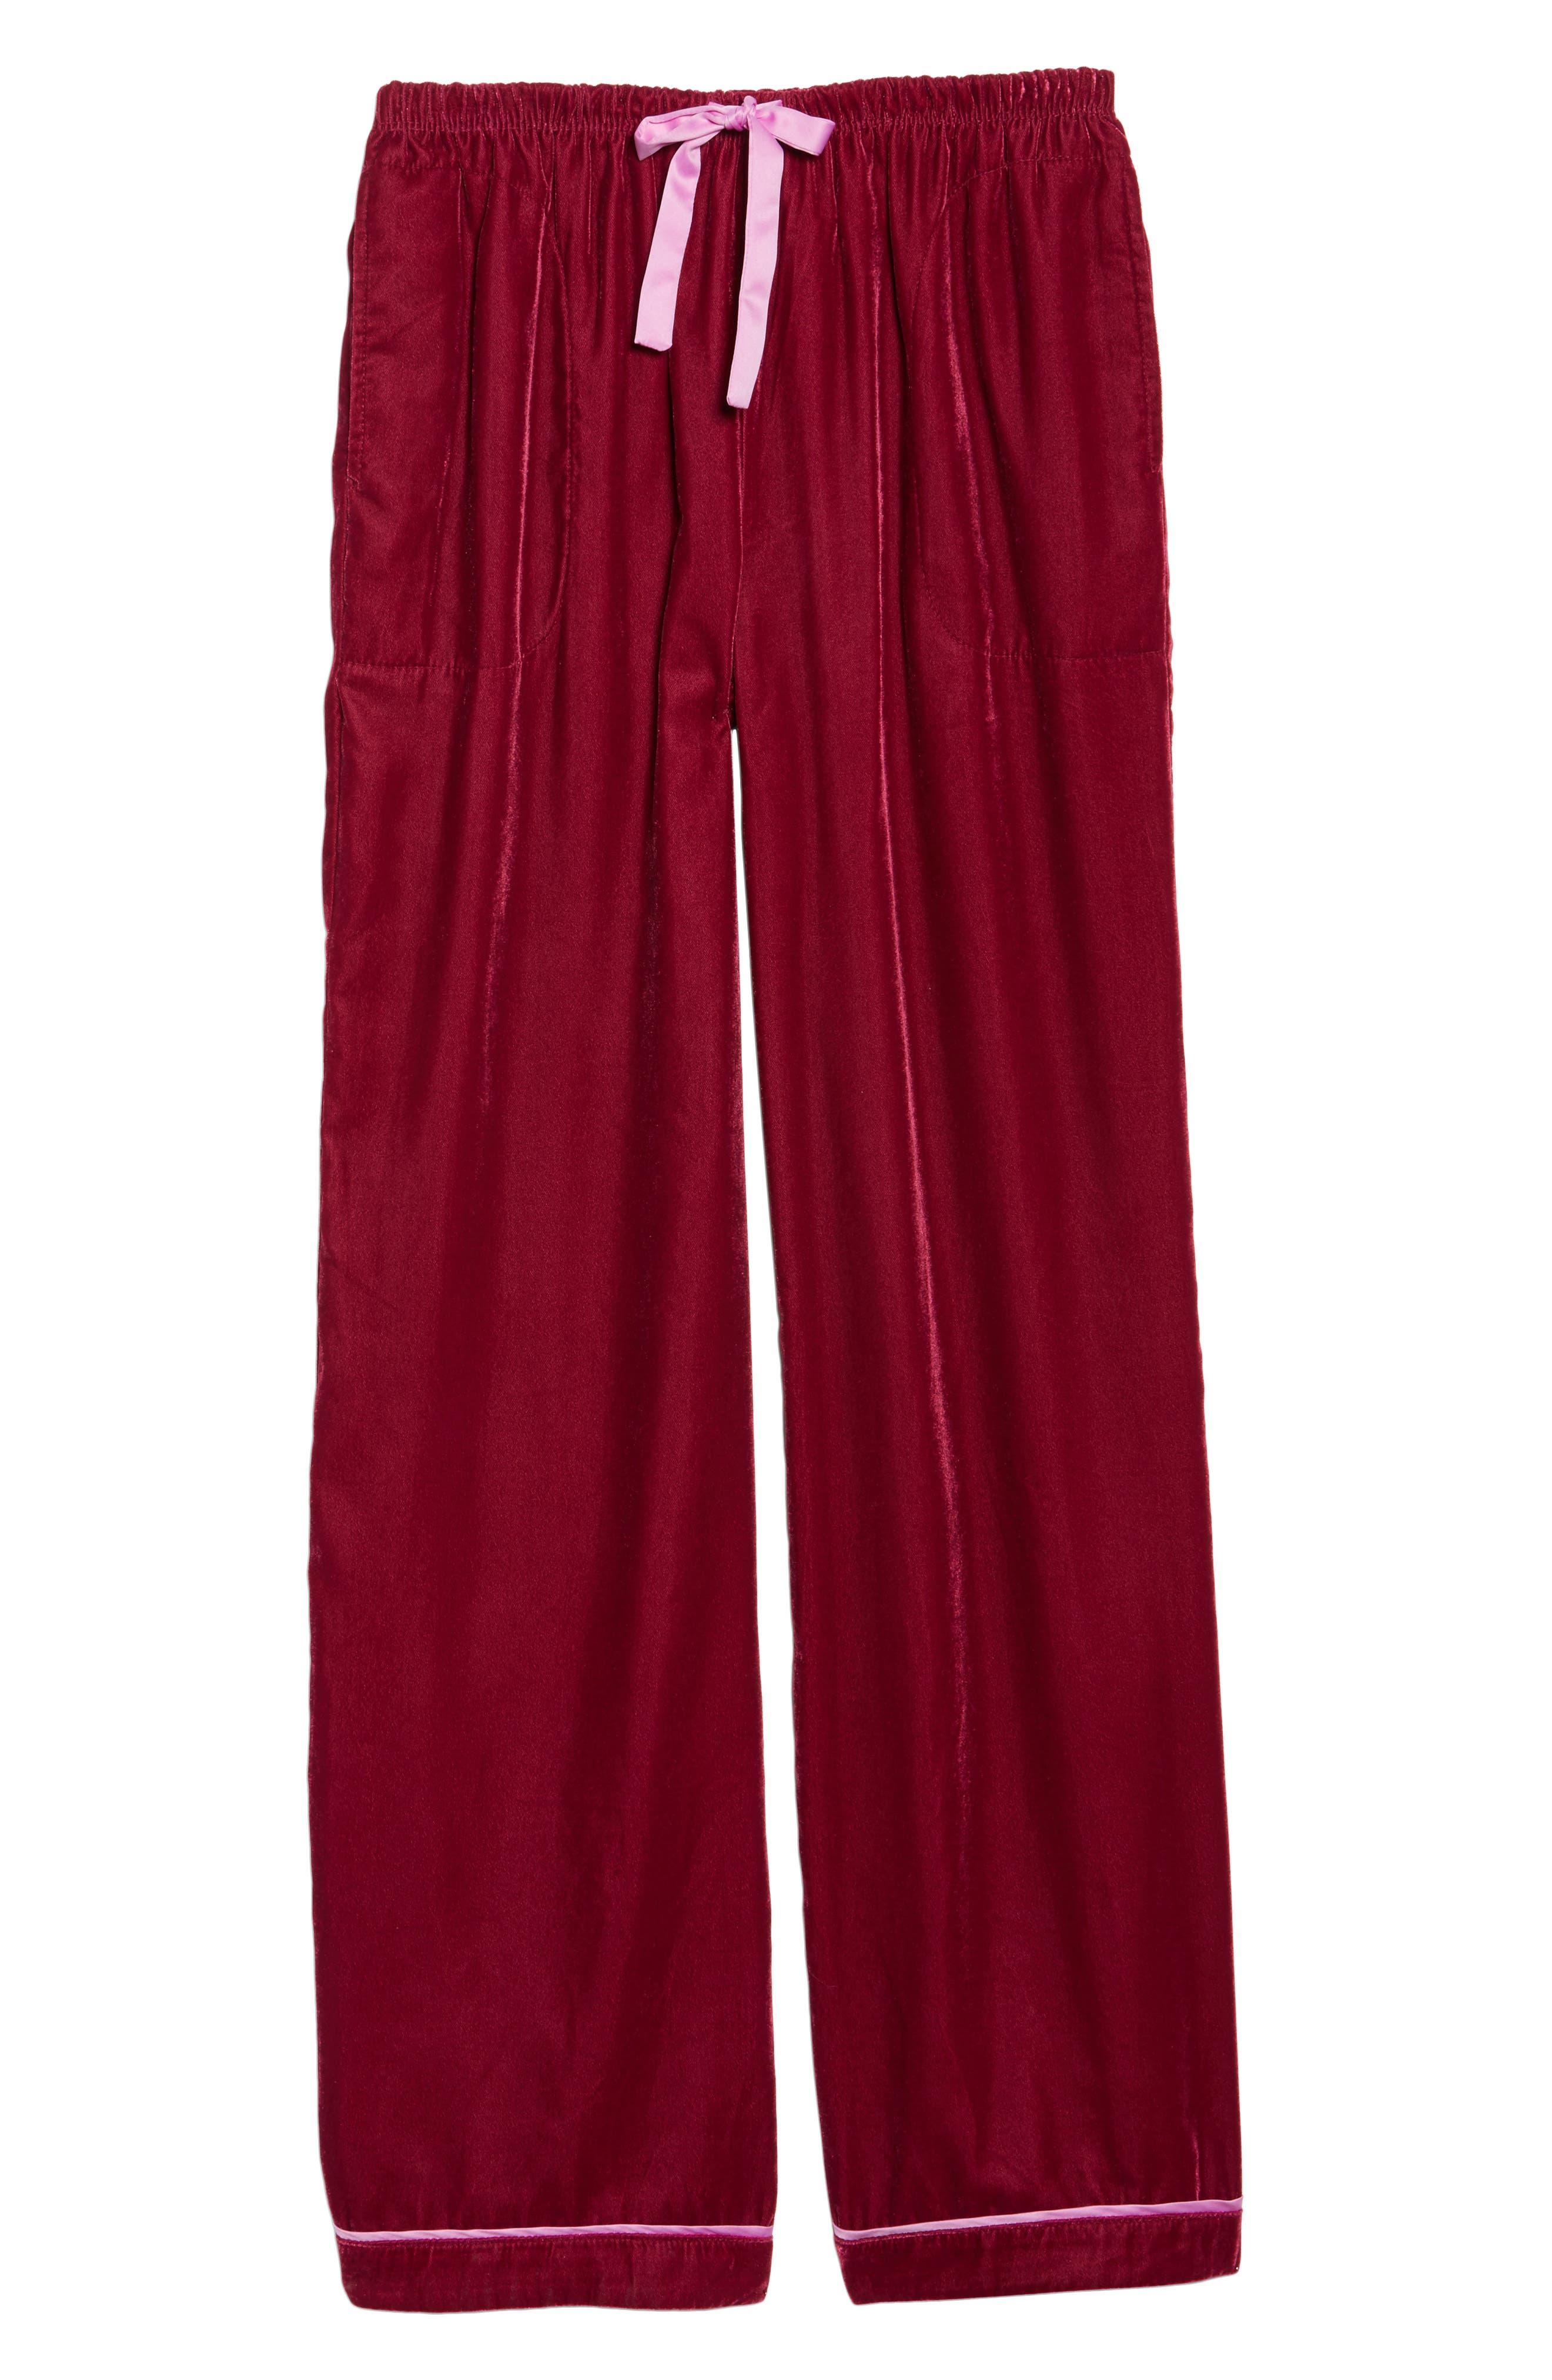 Velvet Pajama Pants,                             Alternate thumbnail 18, color,